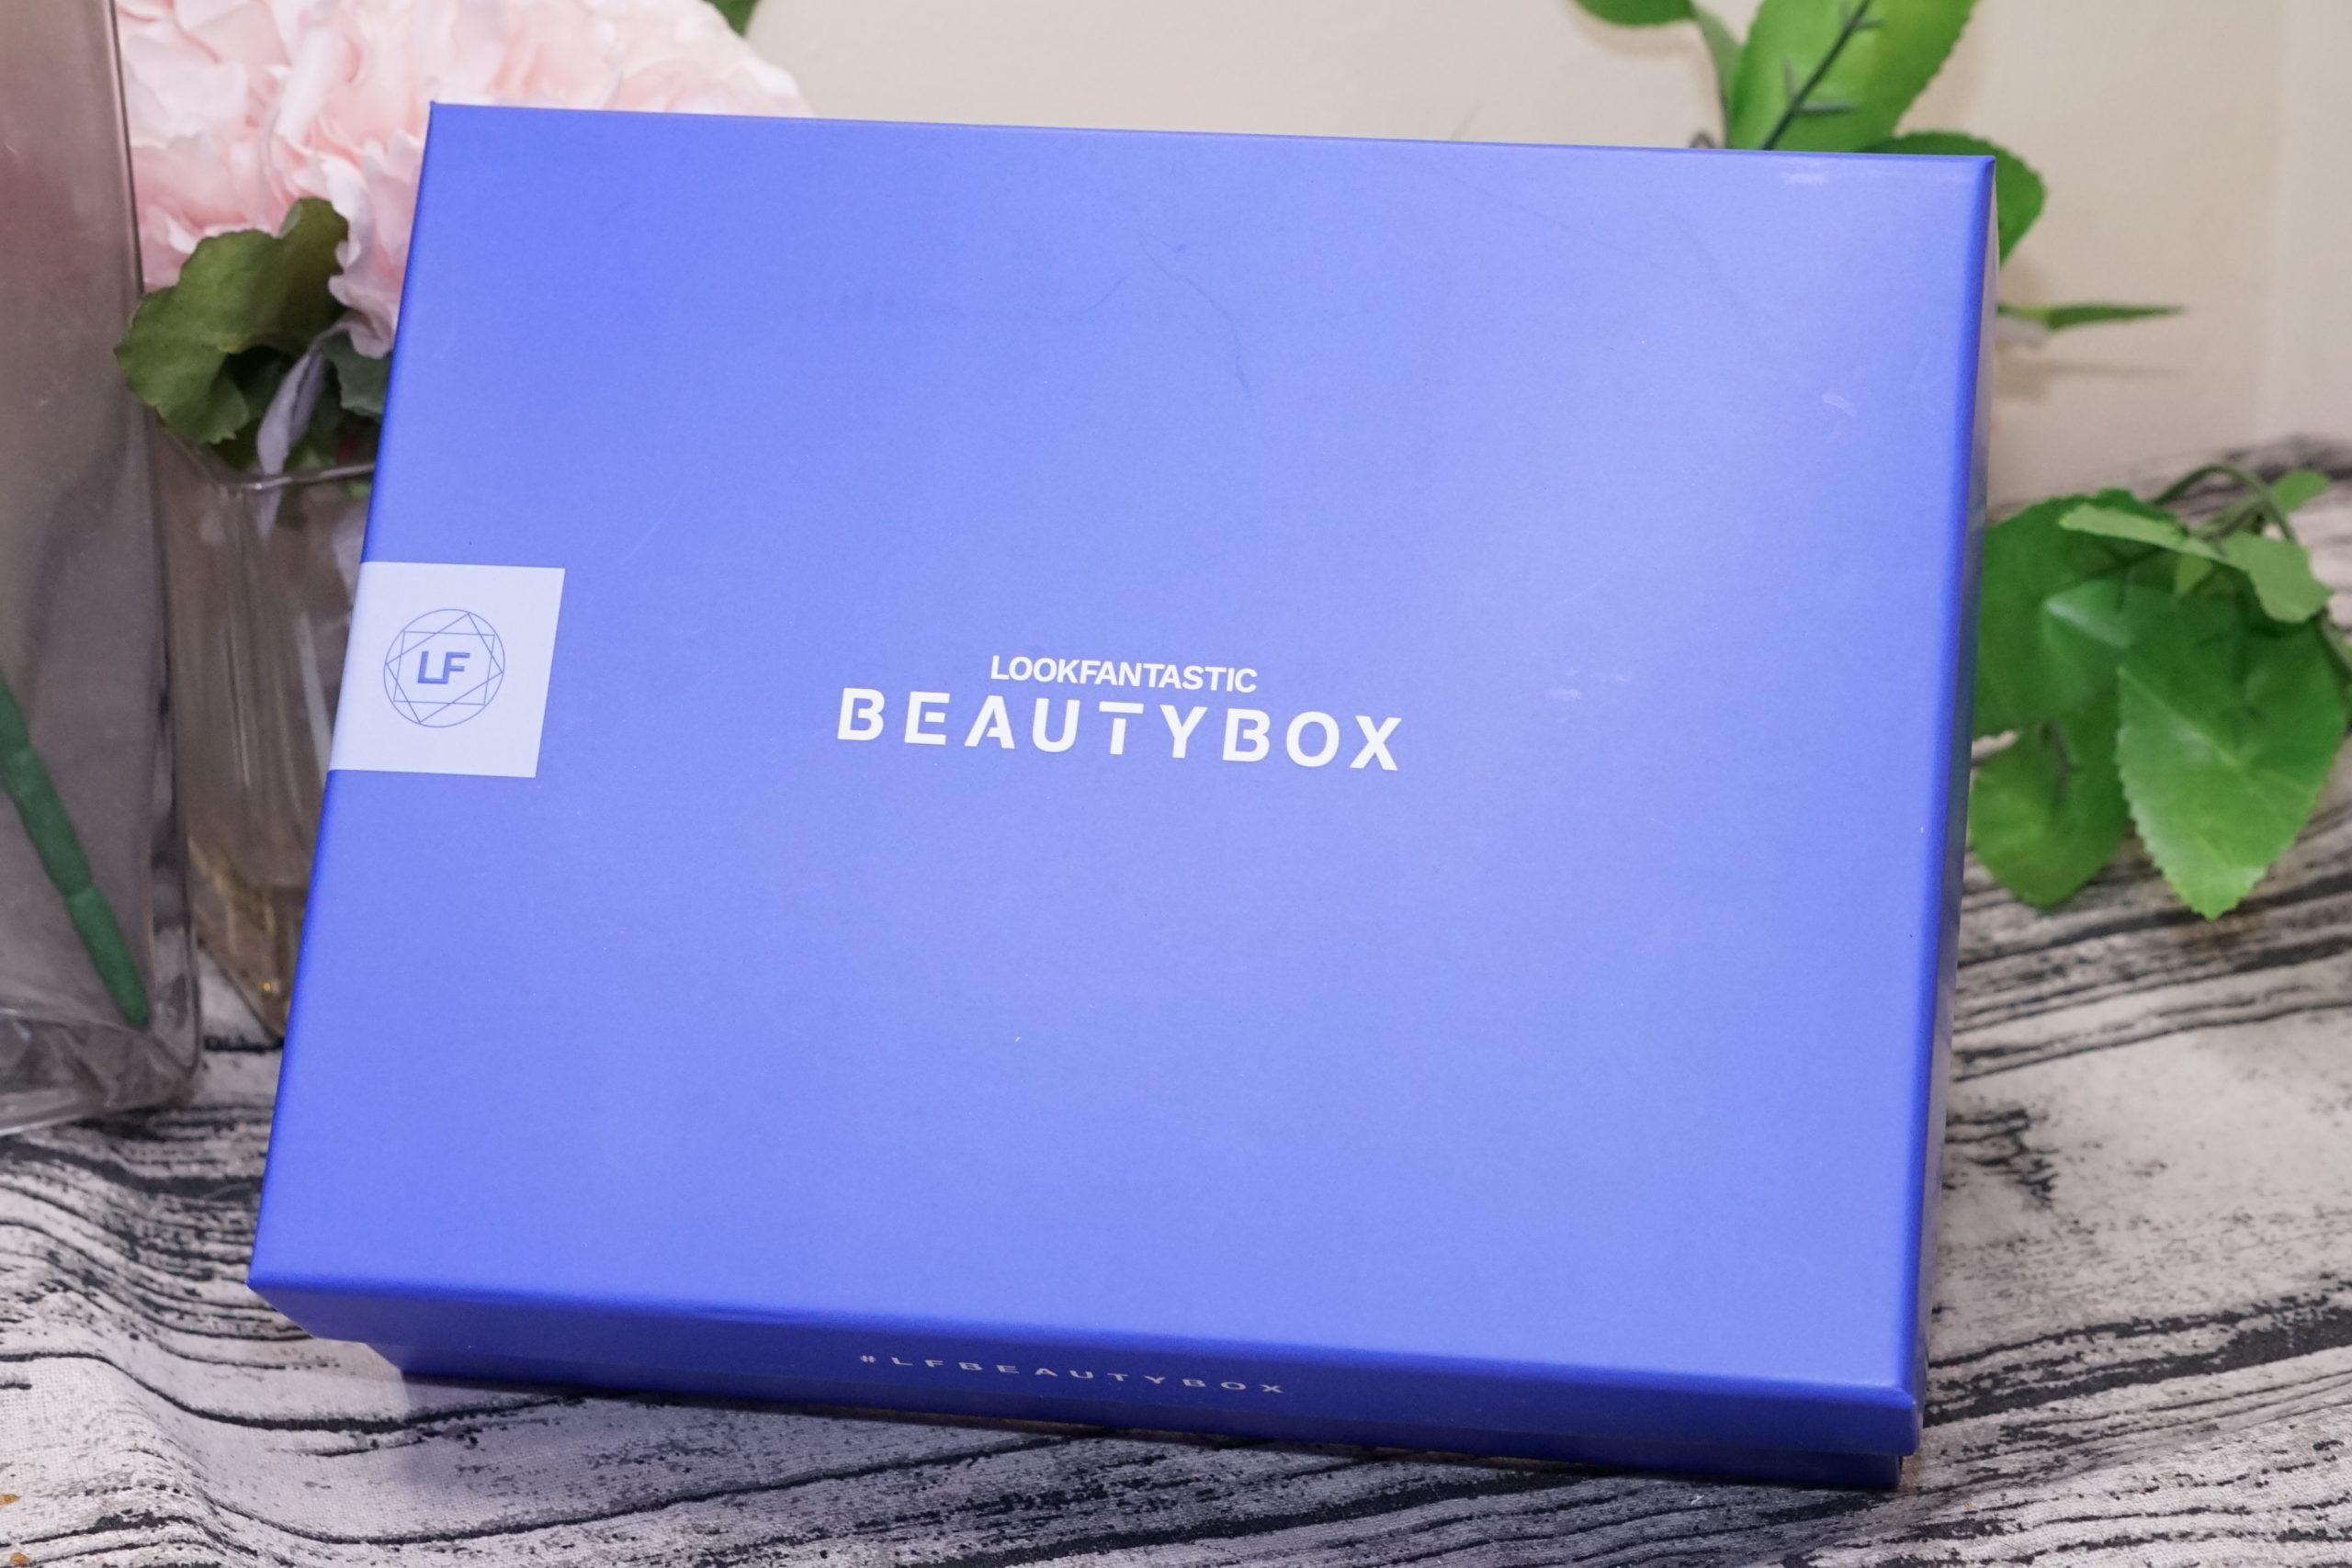 Look Fantastic Beauty Box - October 2020 Edition Box